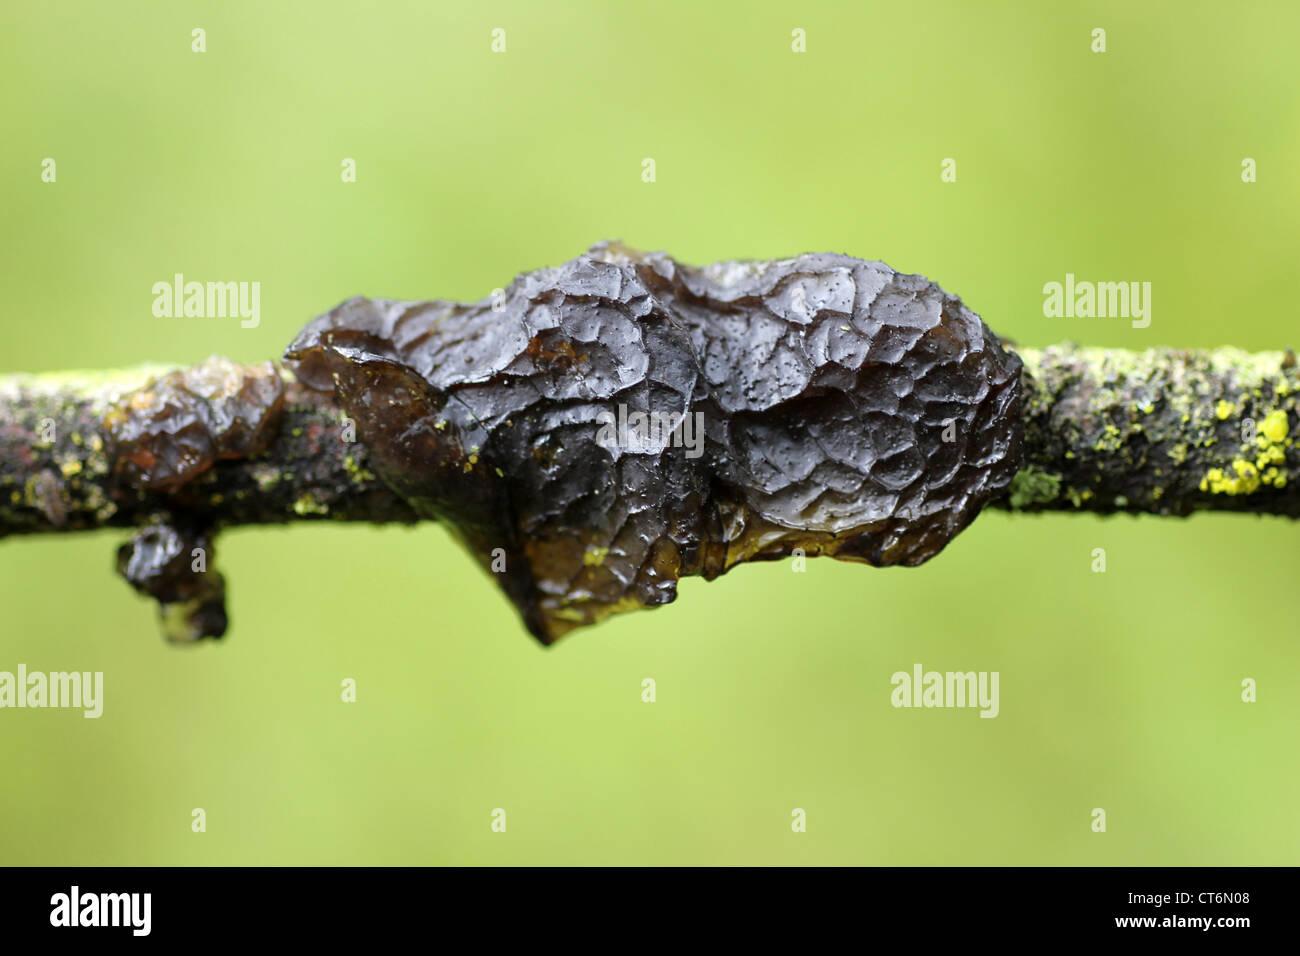 Black Witches' Butter Exidia glandulosa - Stock Image